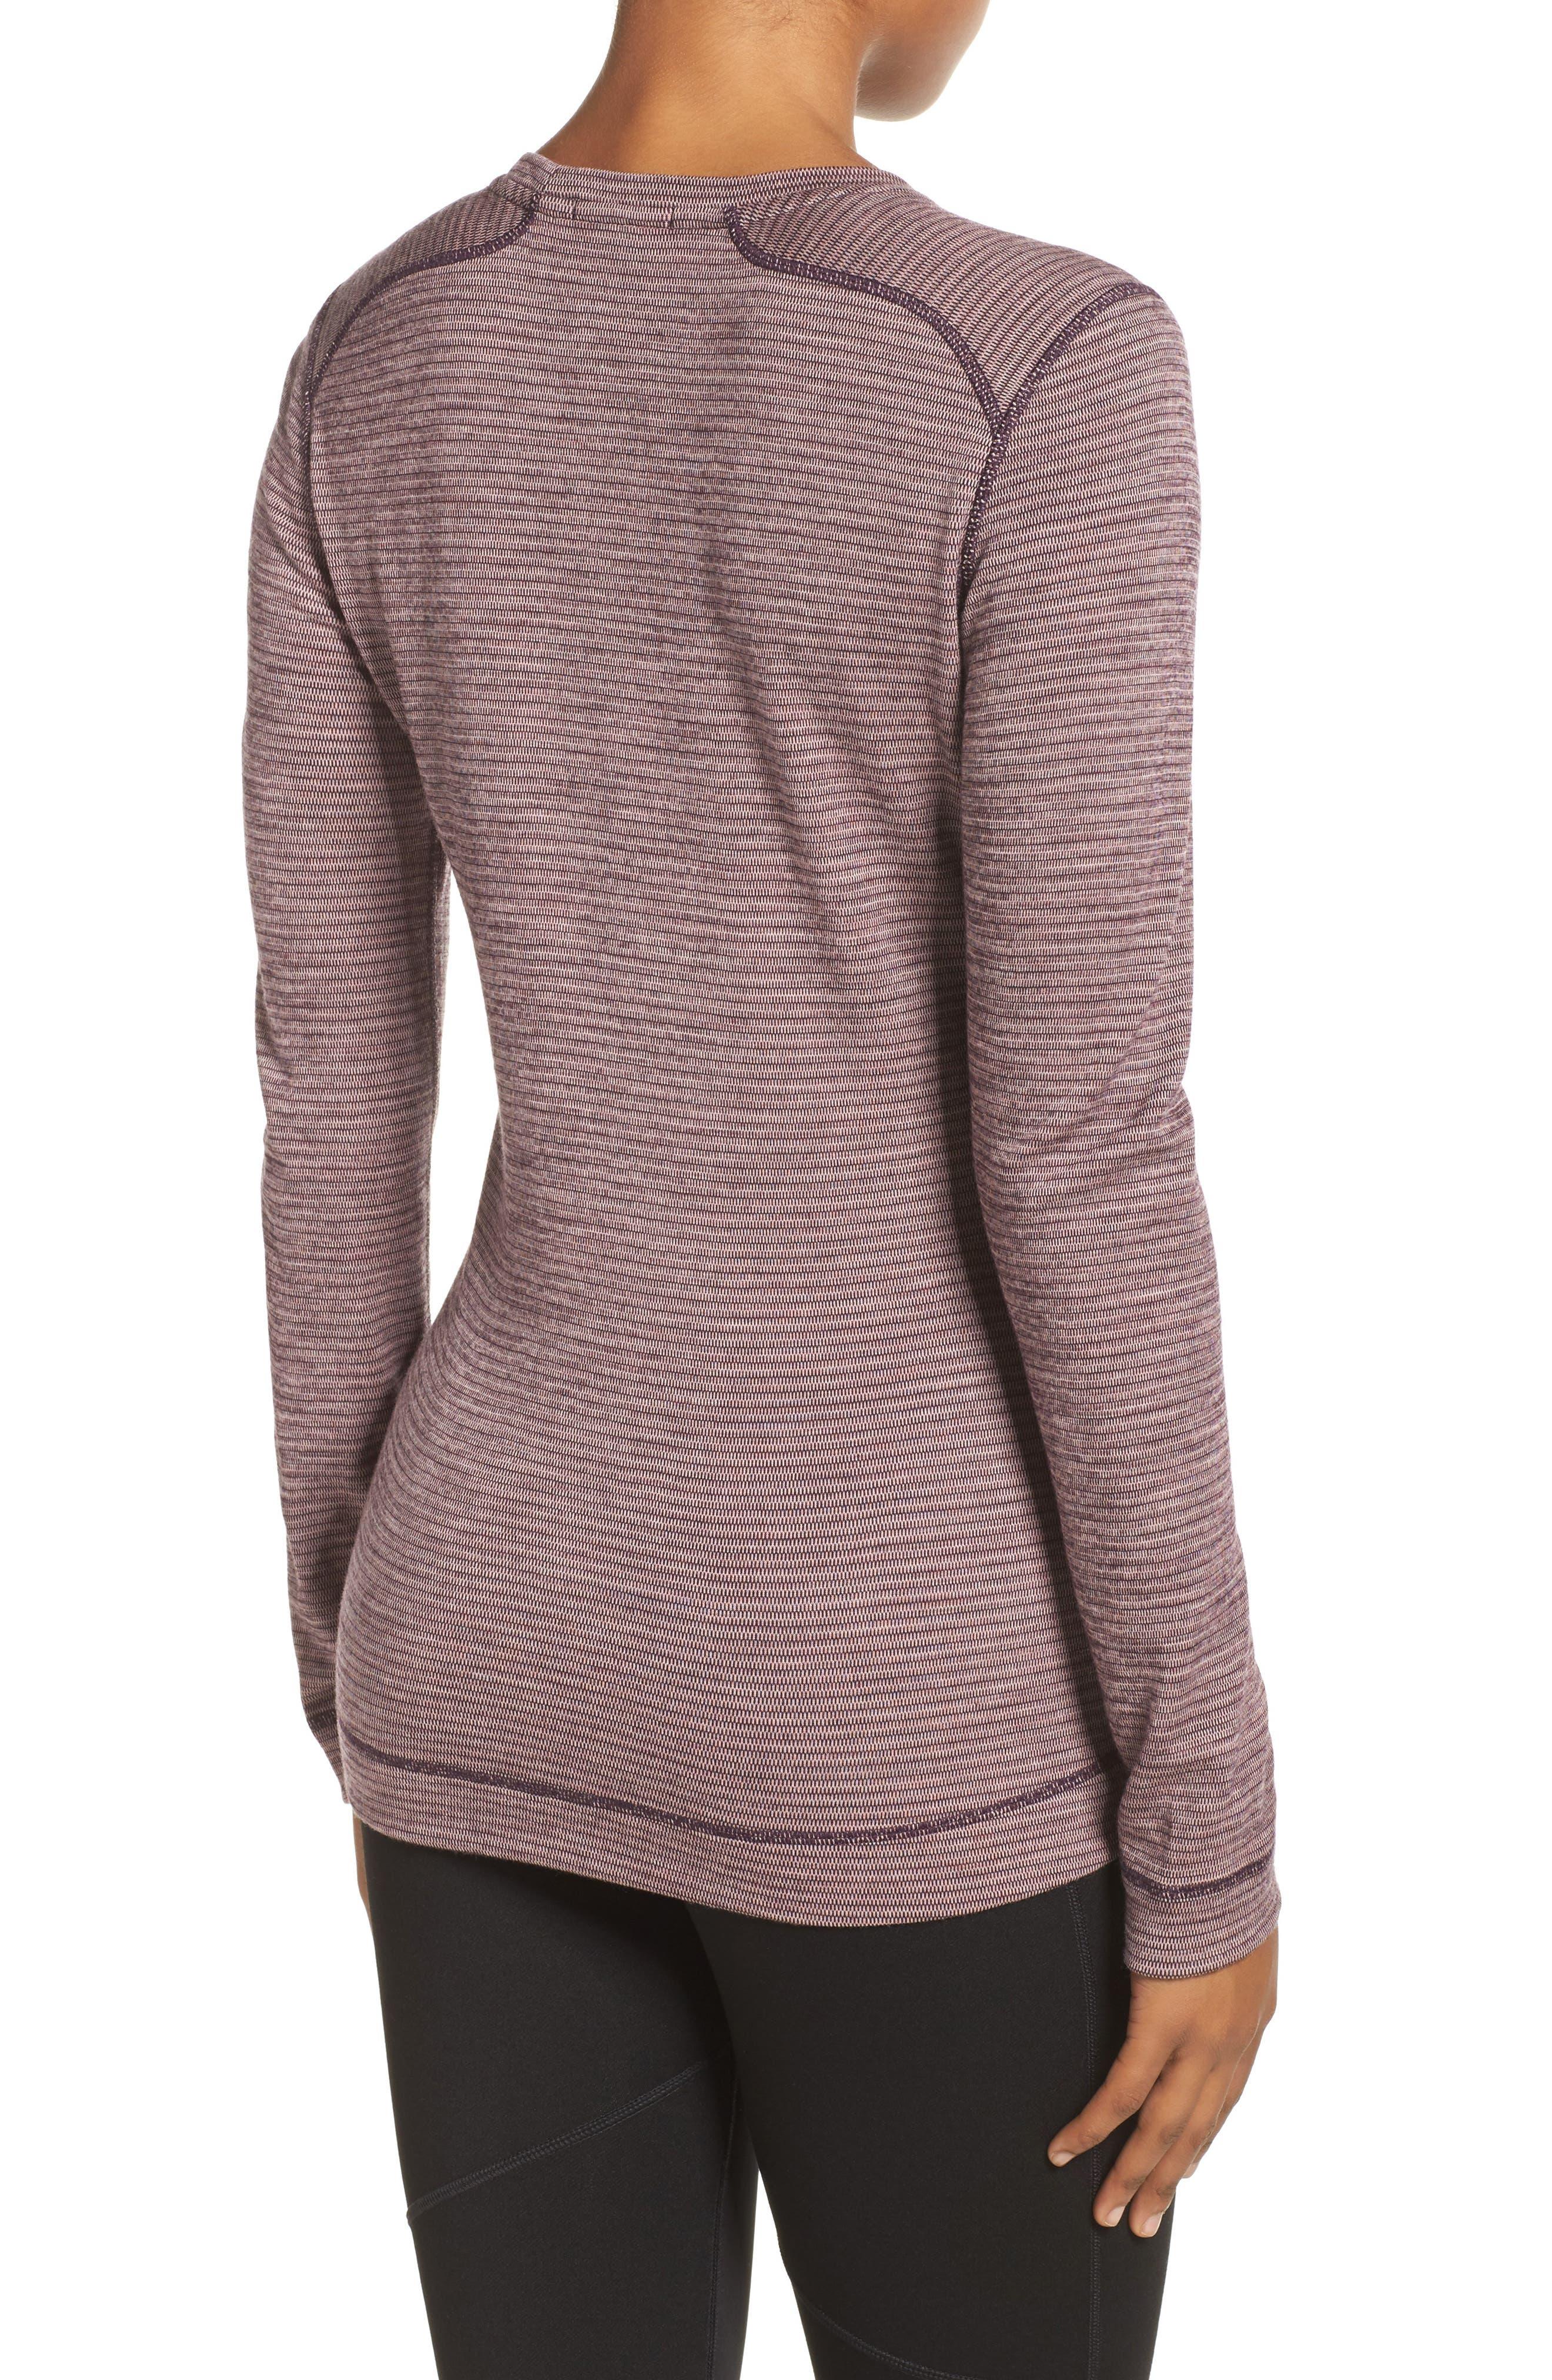 Merino Wool 250 Base Layer Top,                             Alternate thumbnail 2, color,                             BORDEAUX